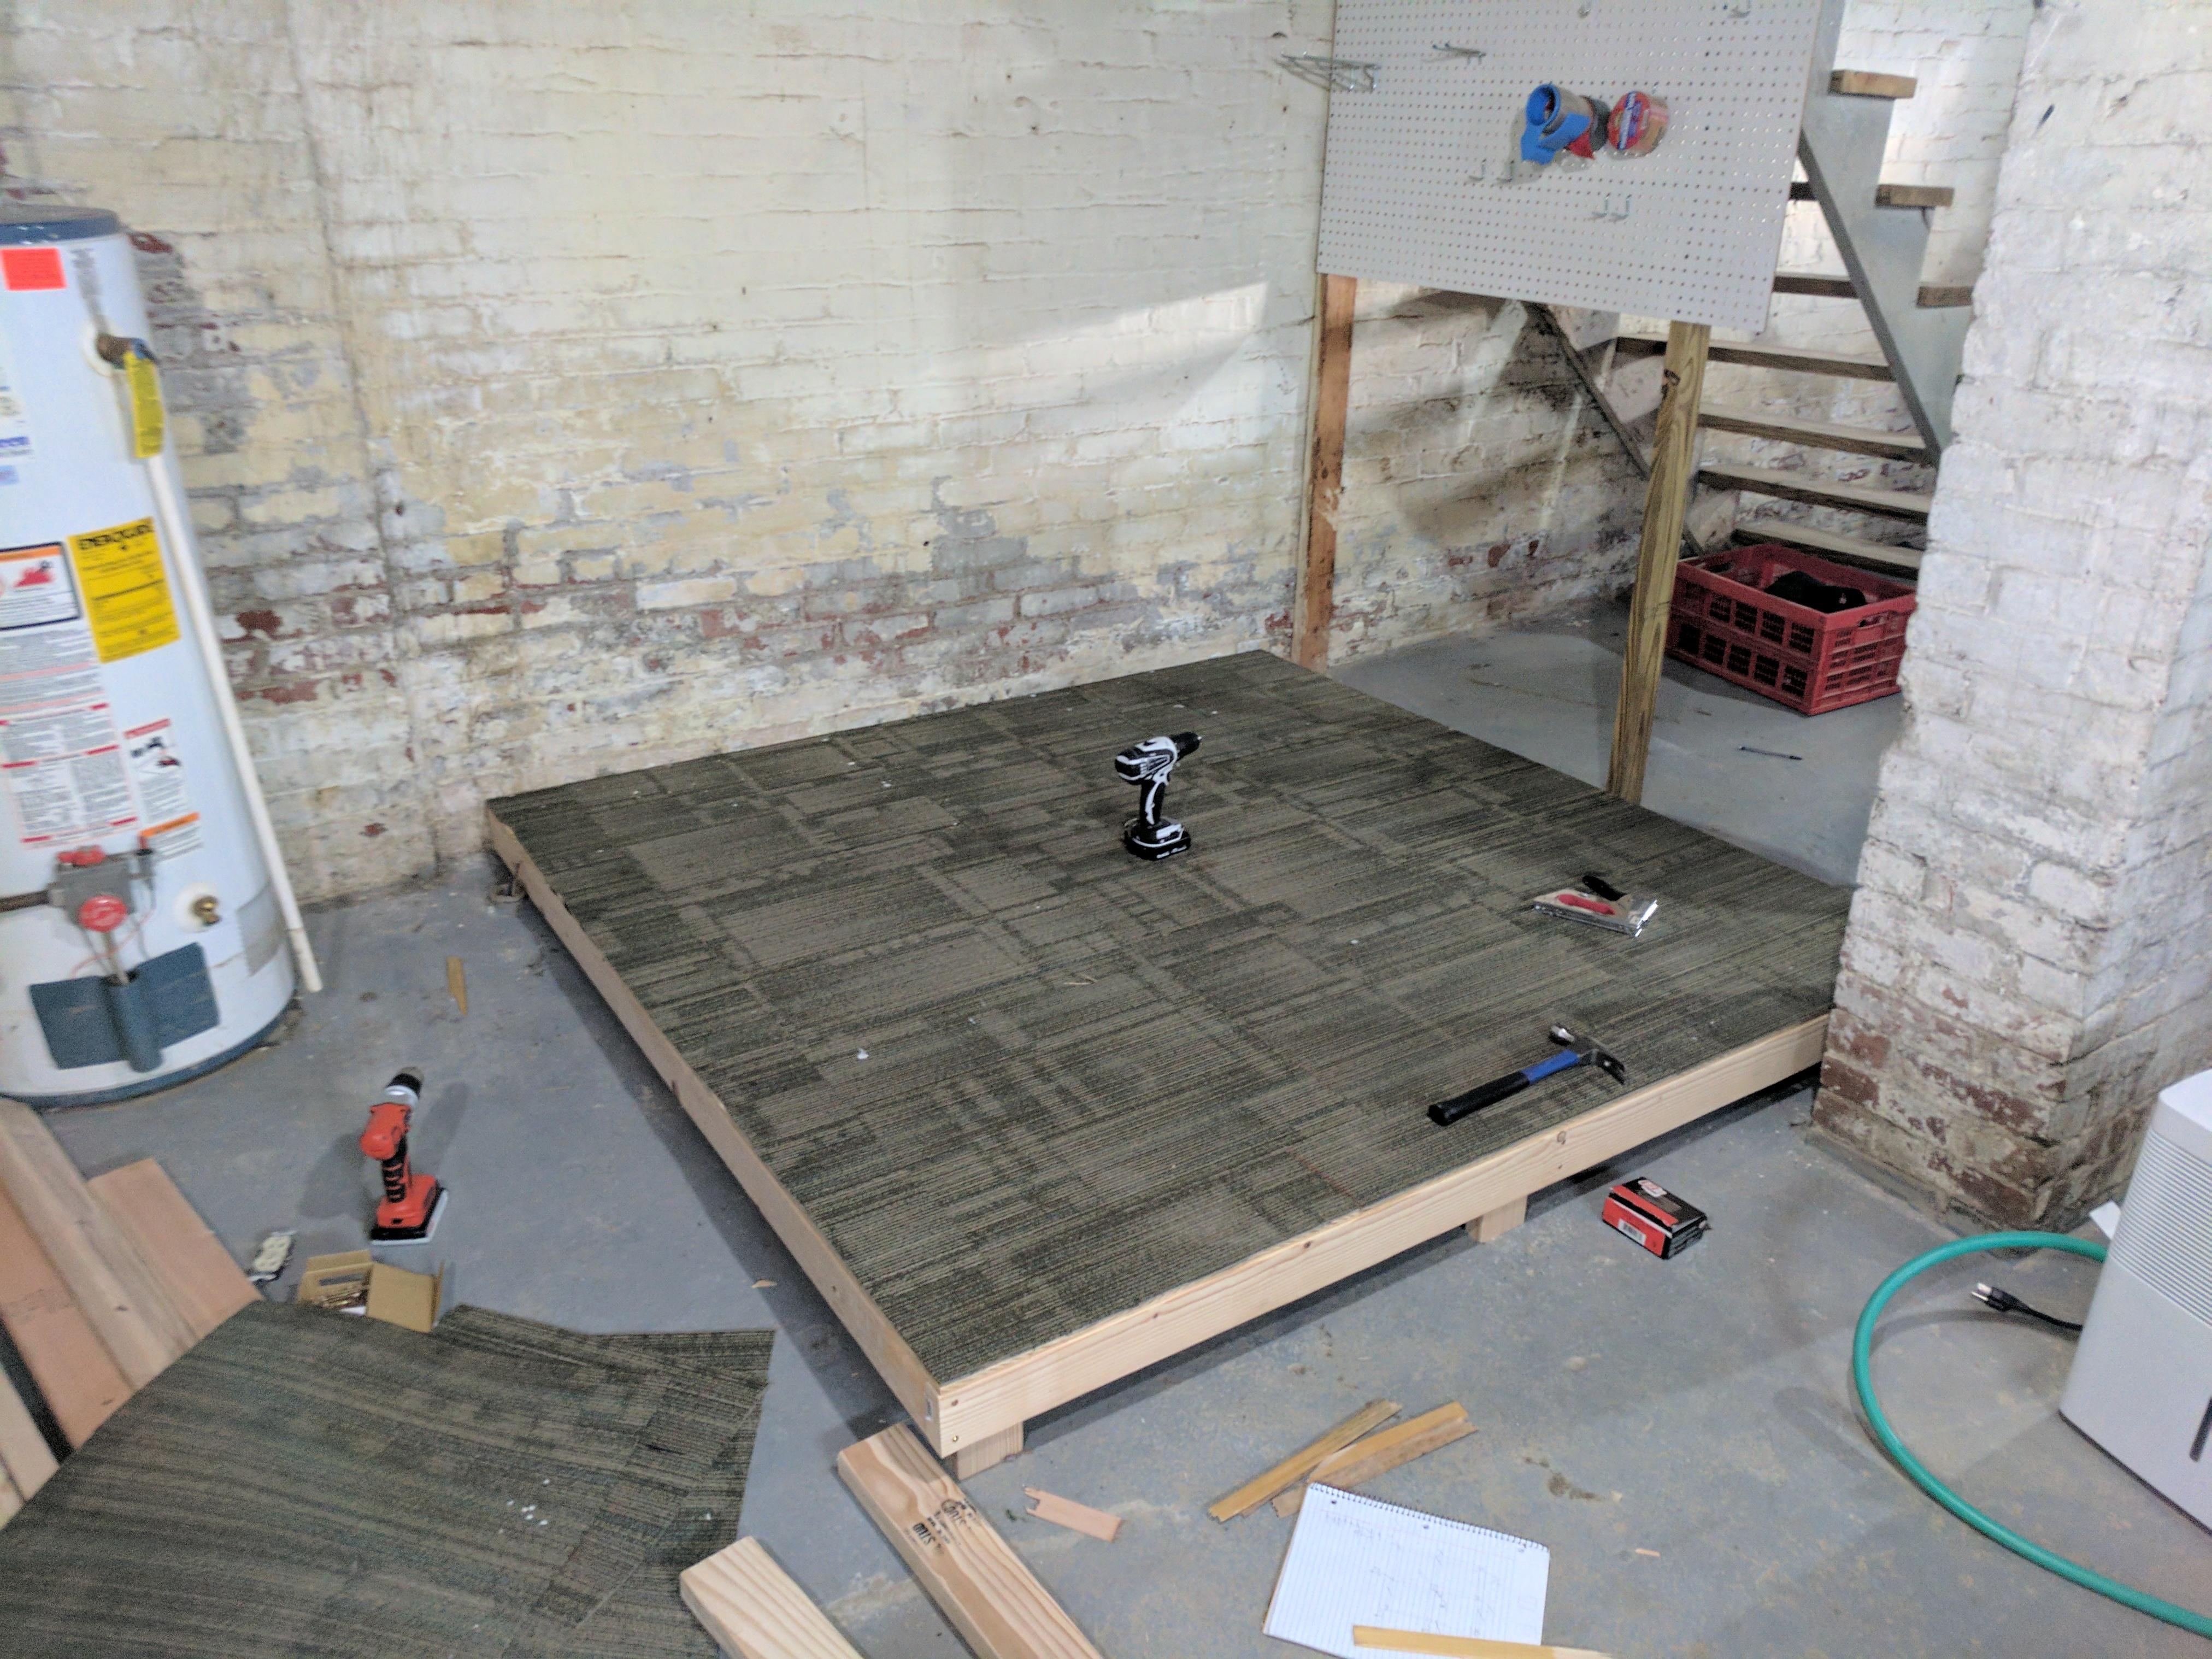 Raw plywood sucks, so we instead we get old office carpeting.